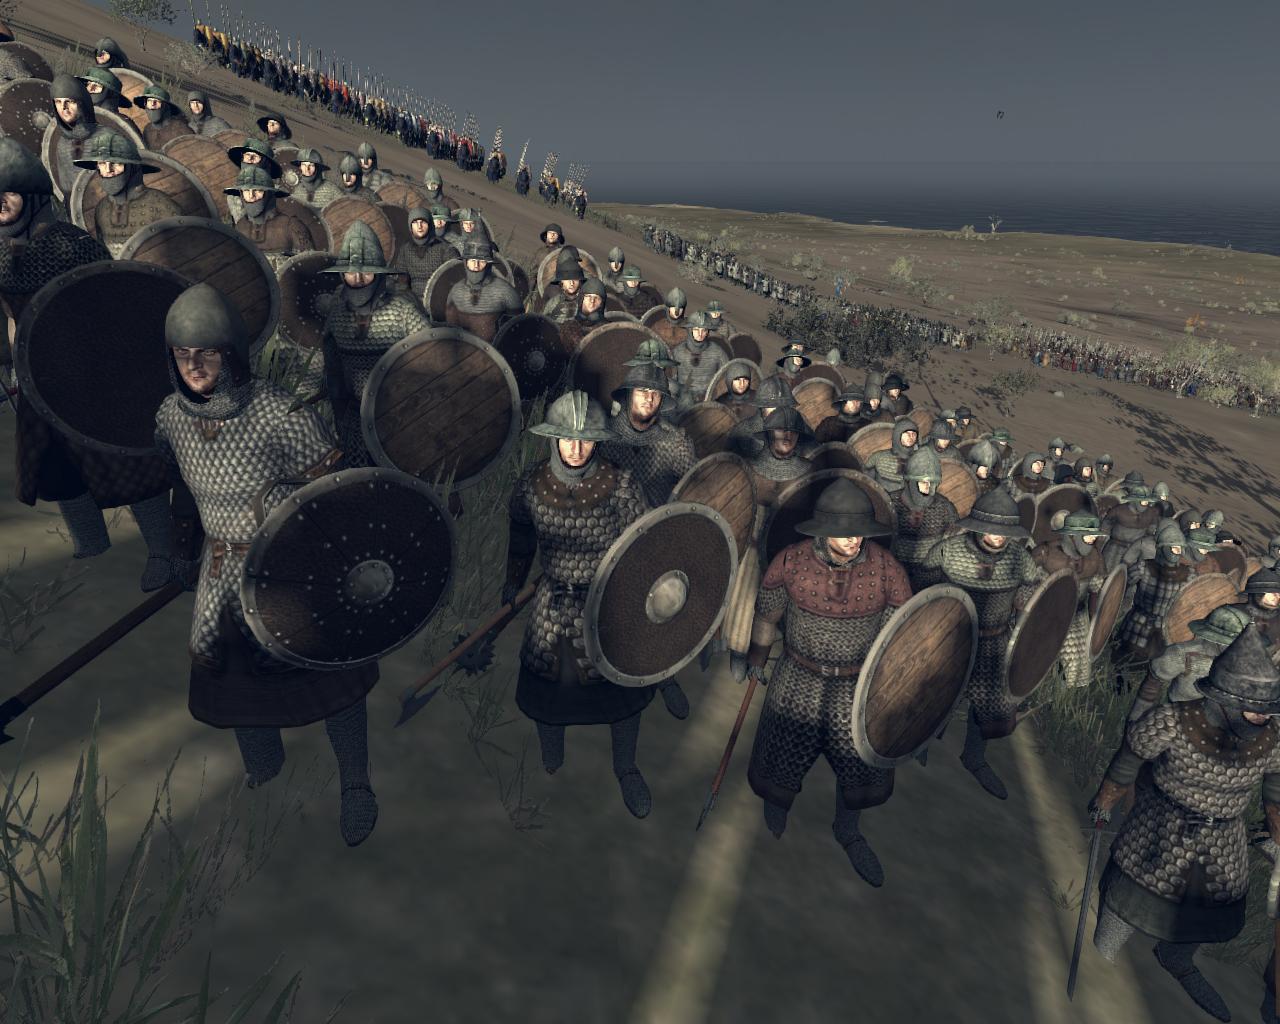 Infantry (Mercenary Unit) image - Medieval Kingdoms: Total ...  Infantry (Merce...